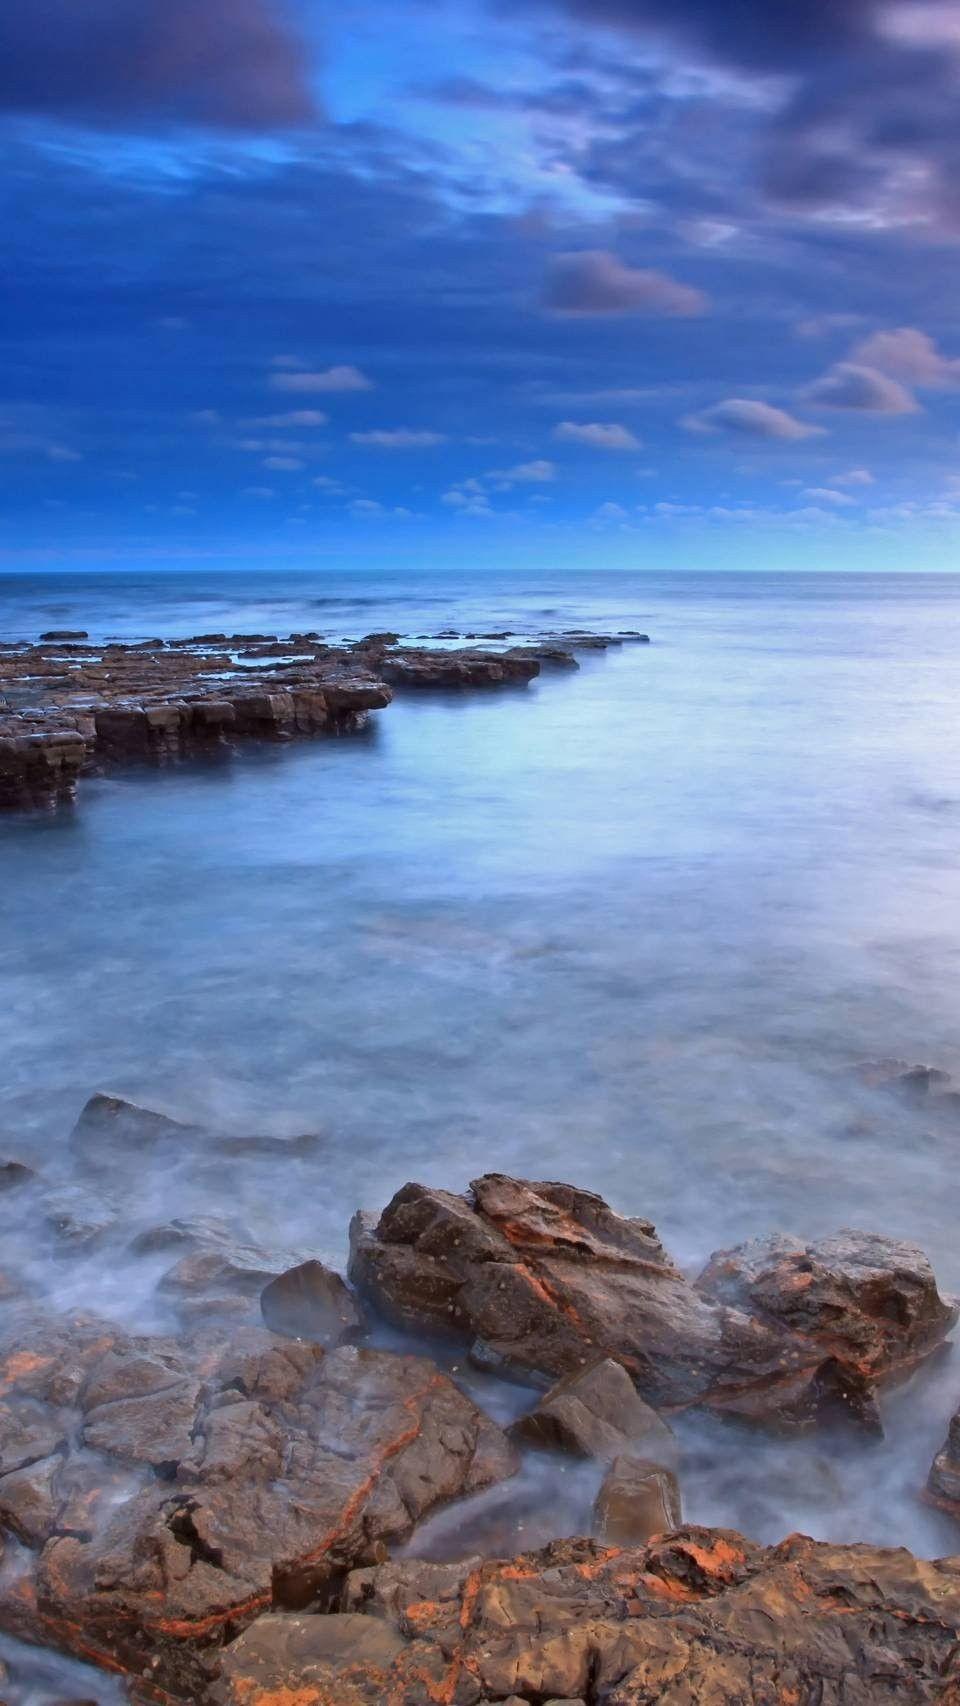 Shades Of Blue Landscape Seascape Photography Nature Photography Beautiful Nature